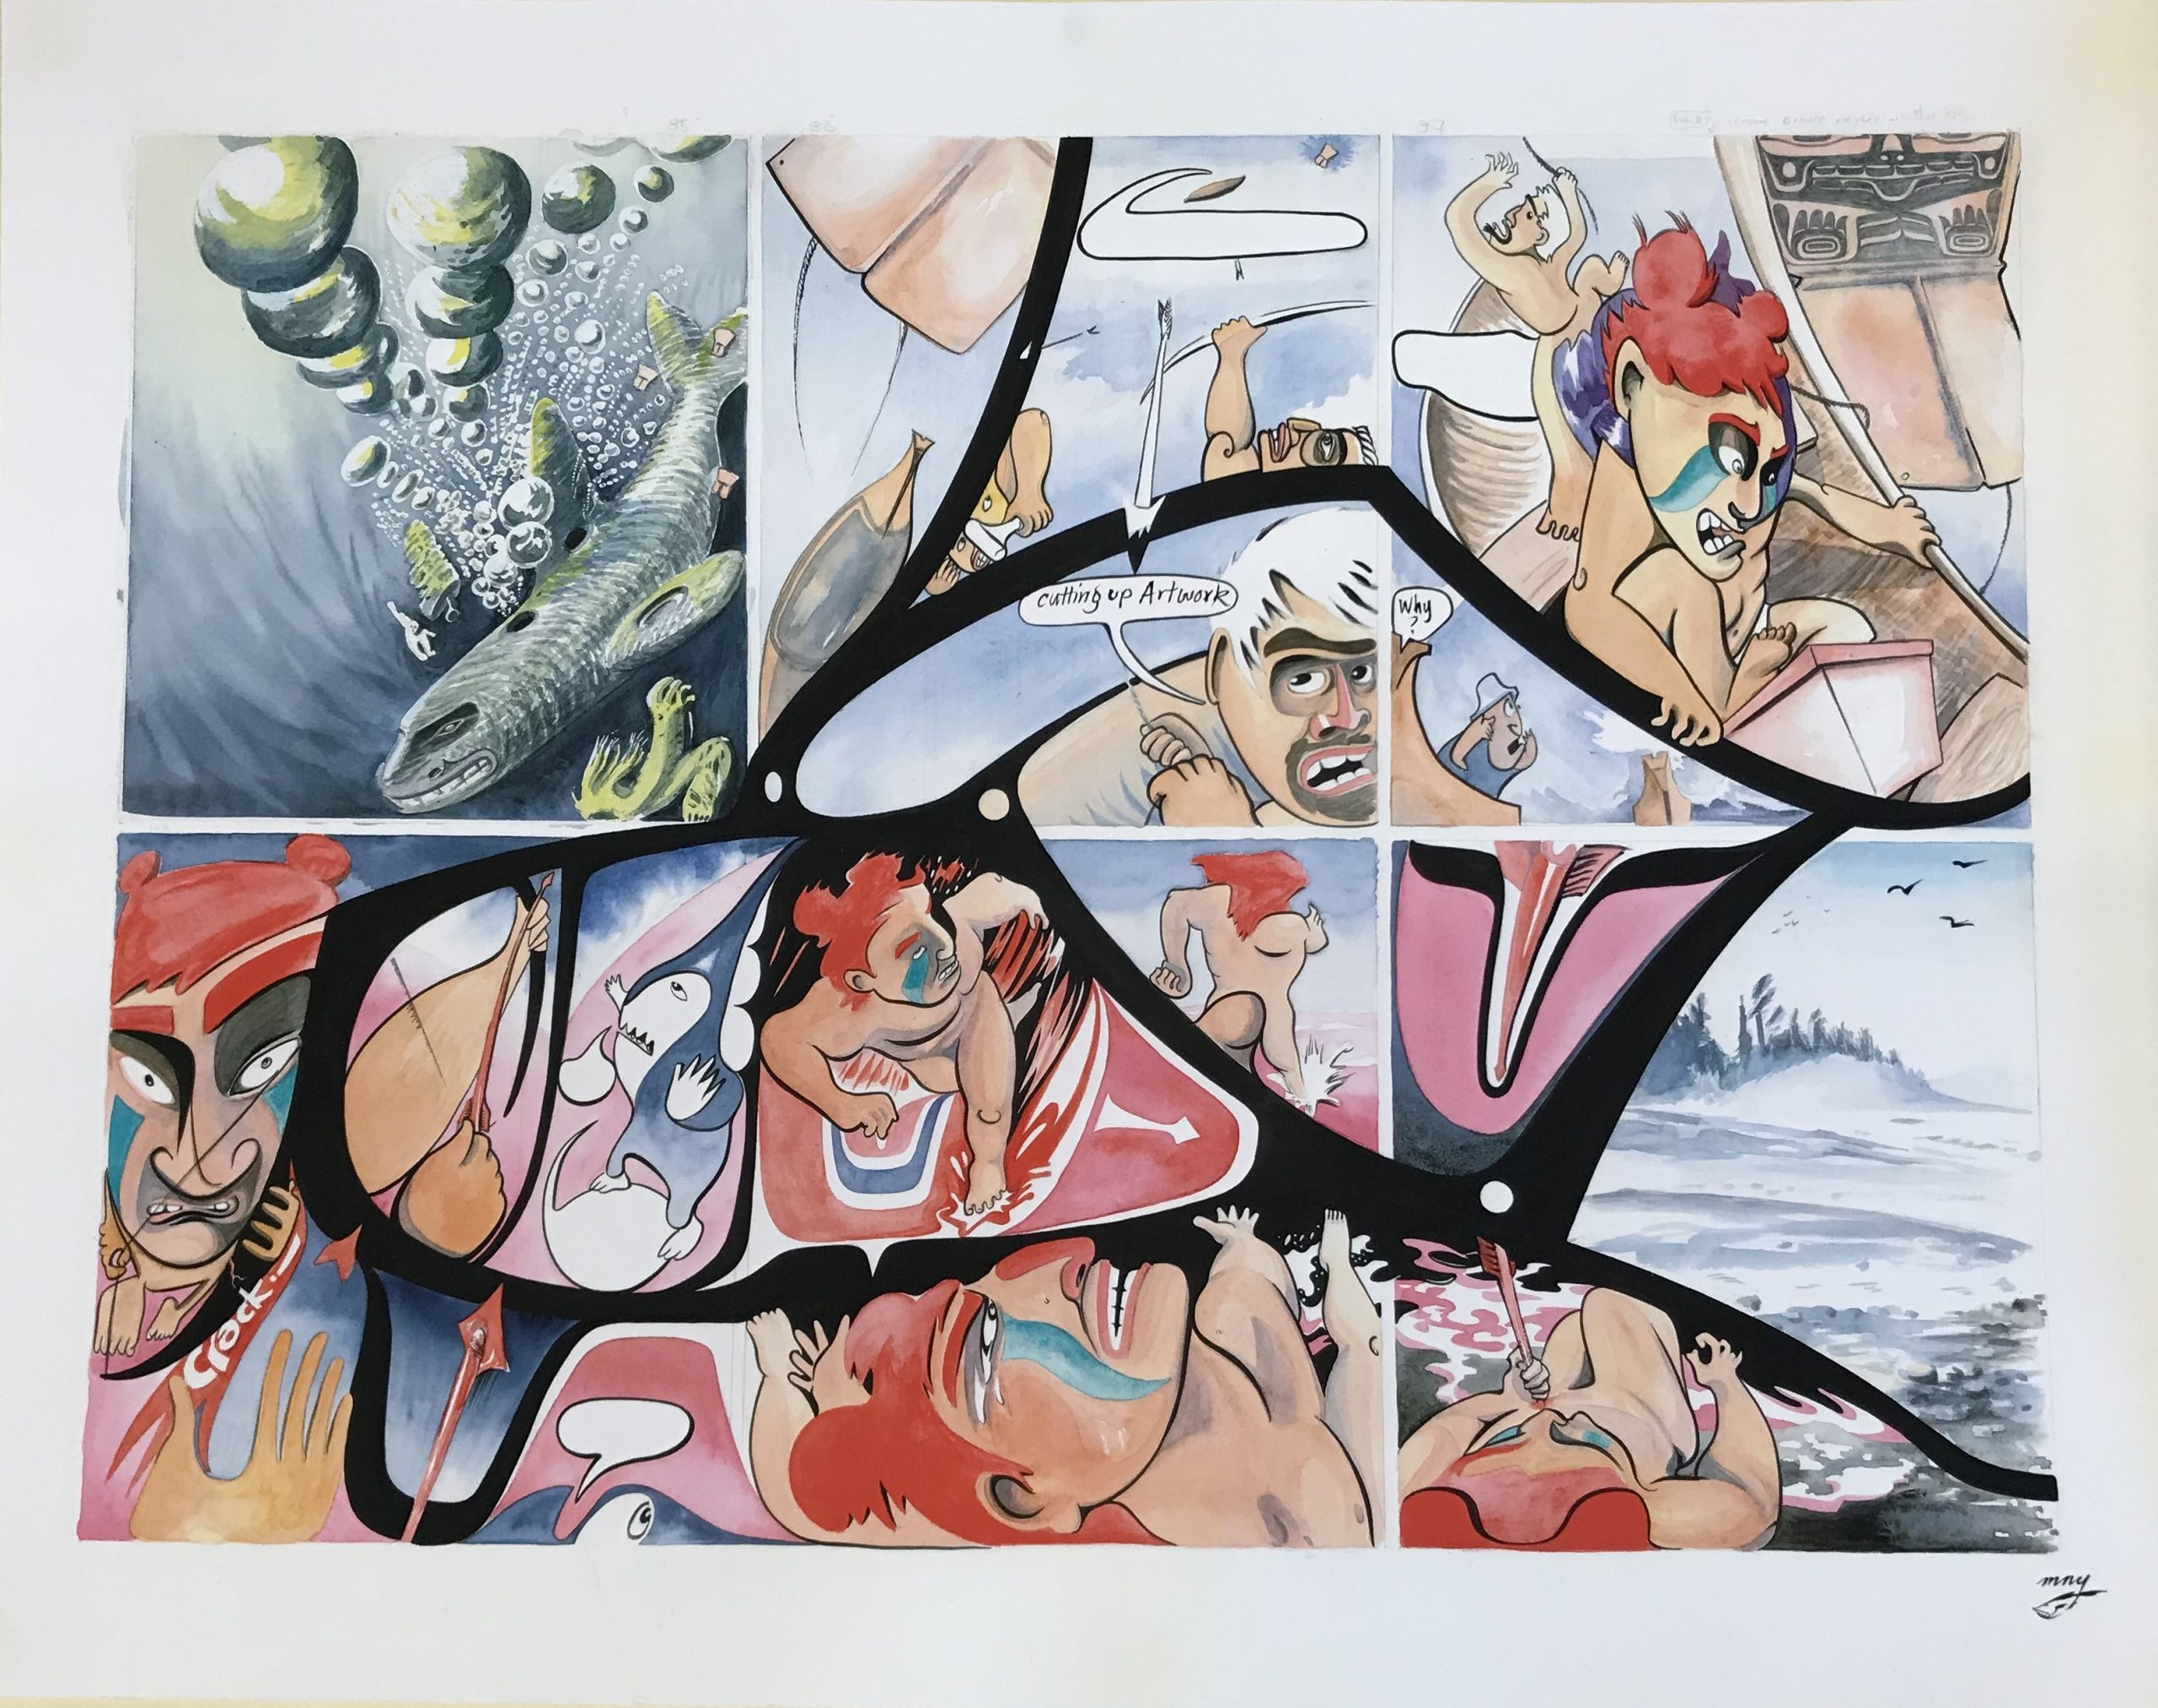 a panel from Michael Nicoll Yahgulanaas's Red